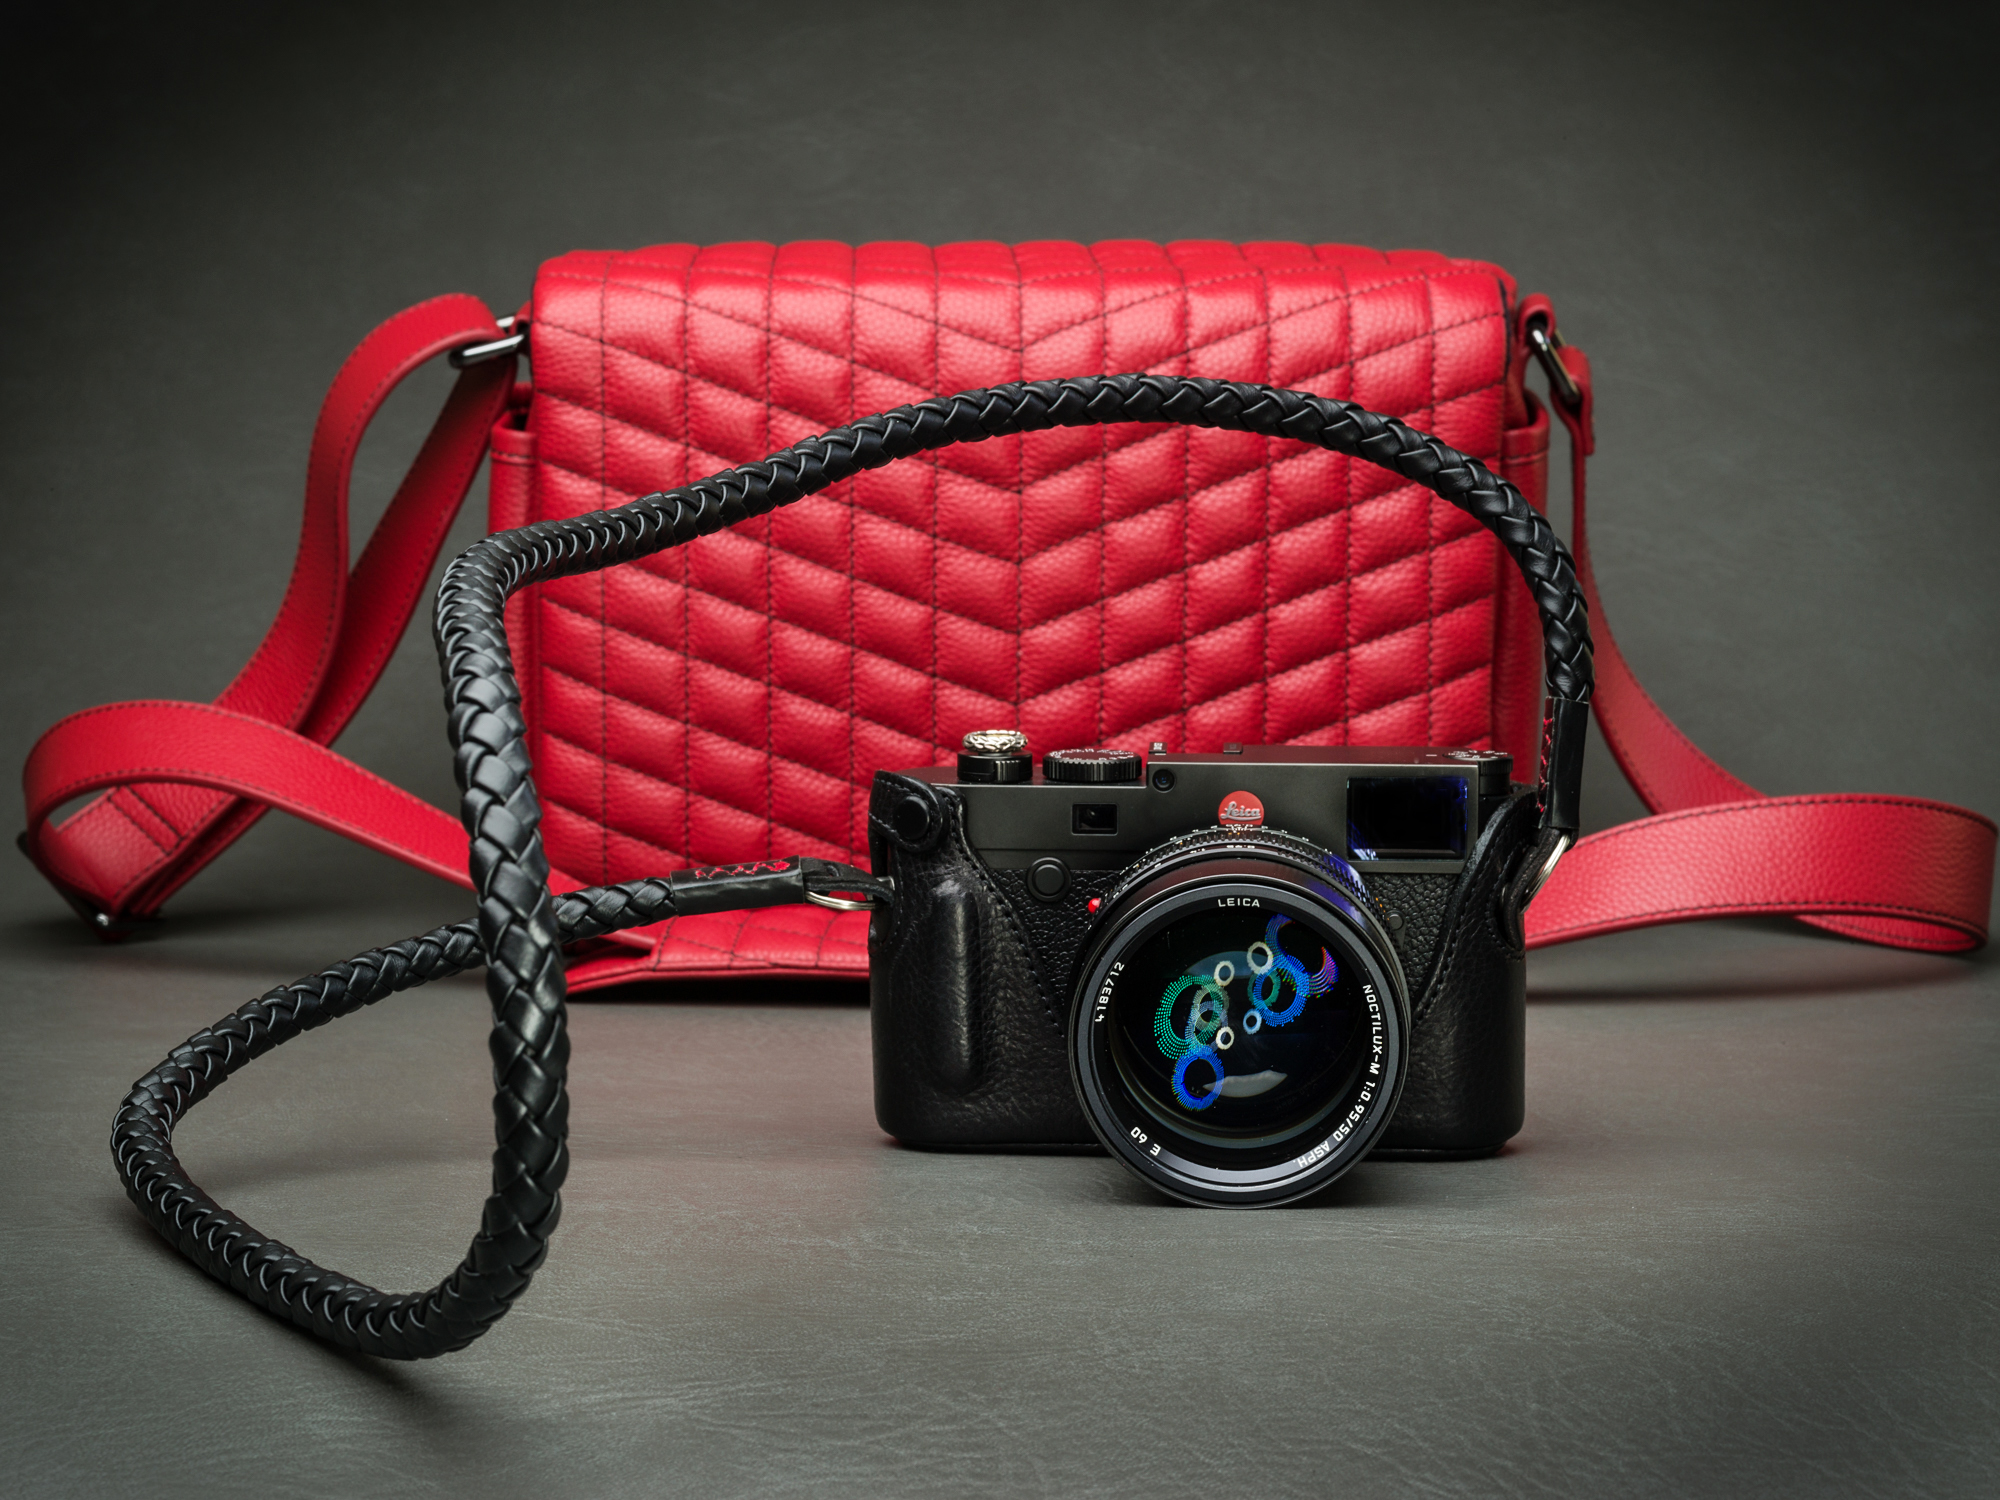 Vi Vante Camera Bags